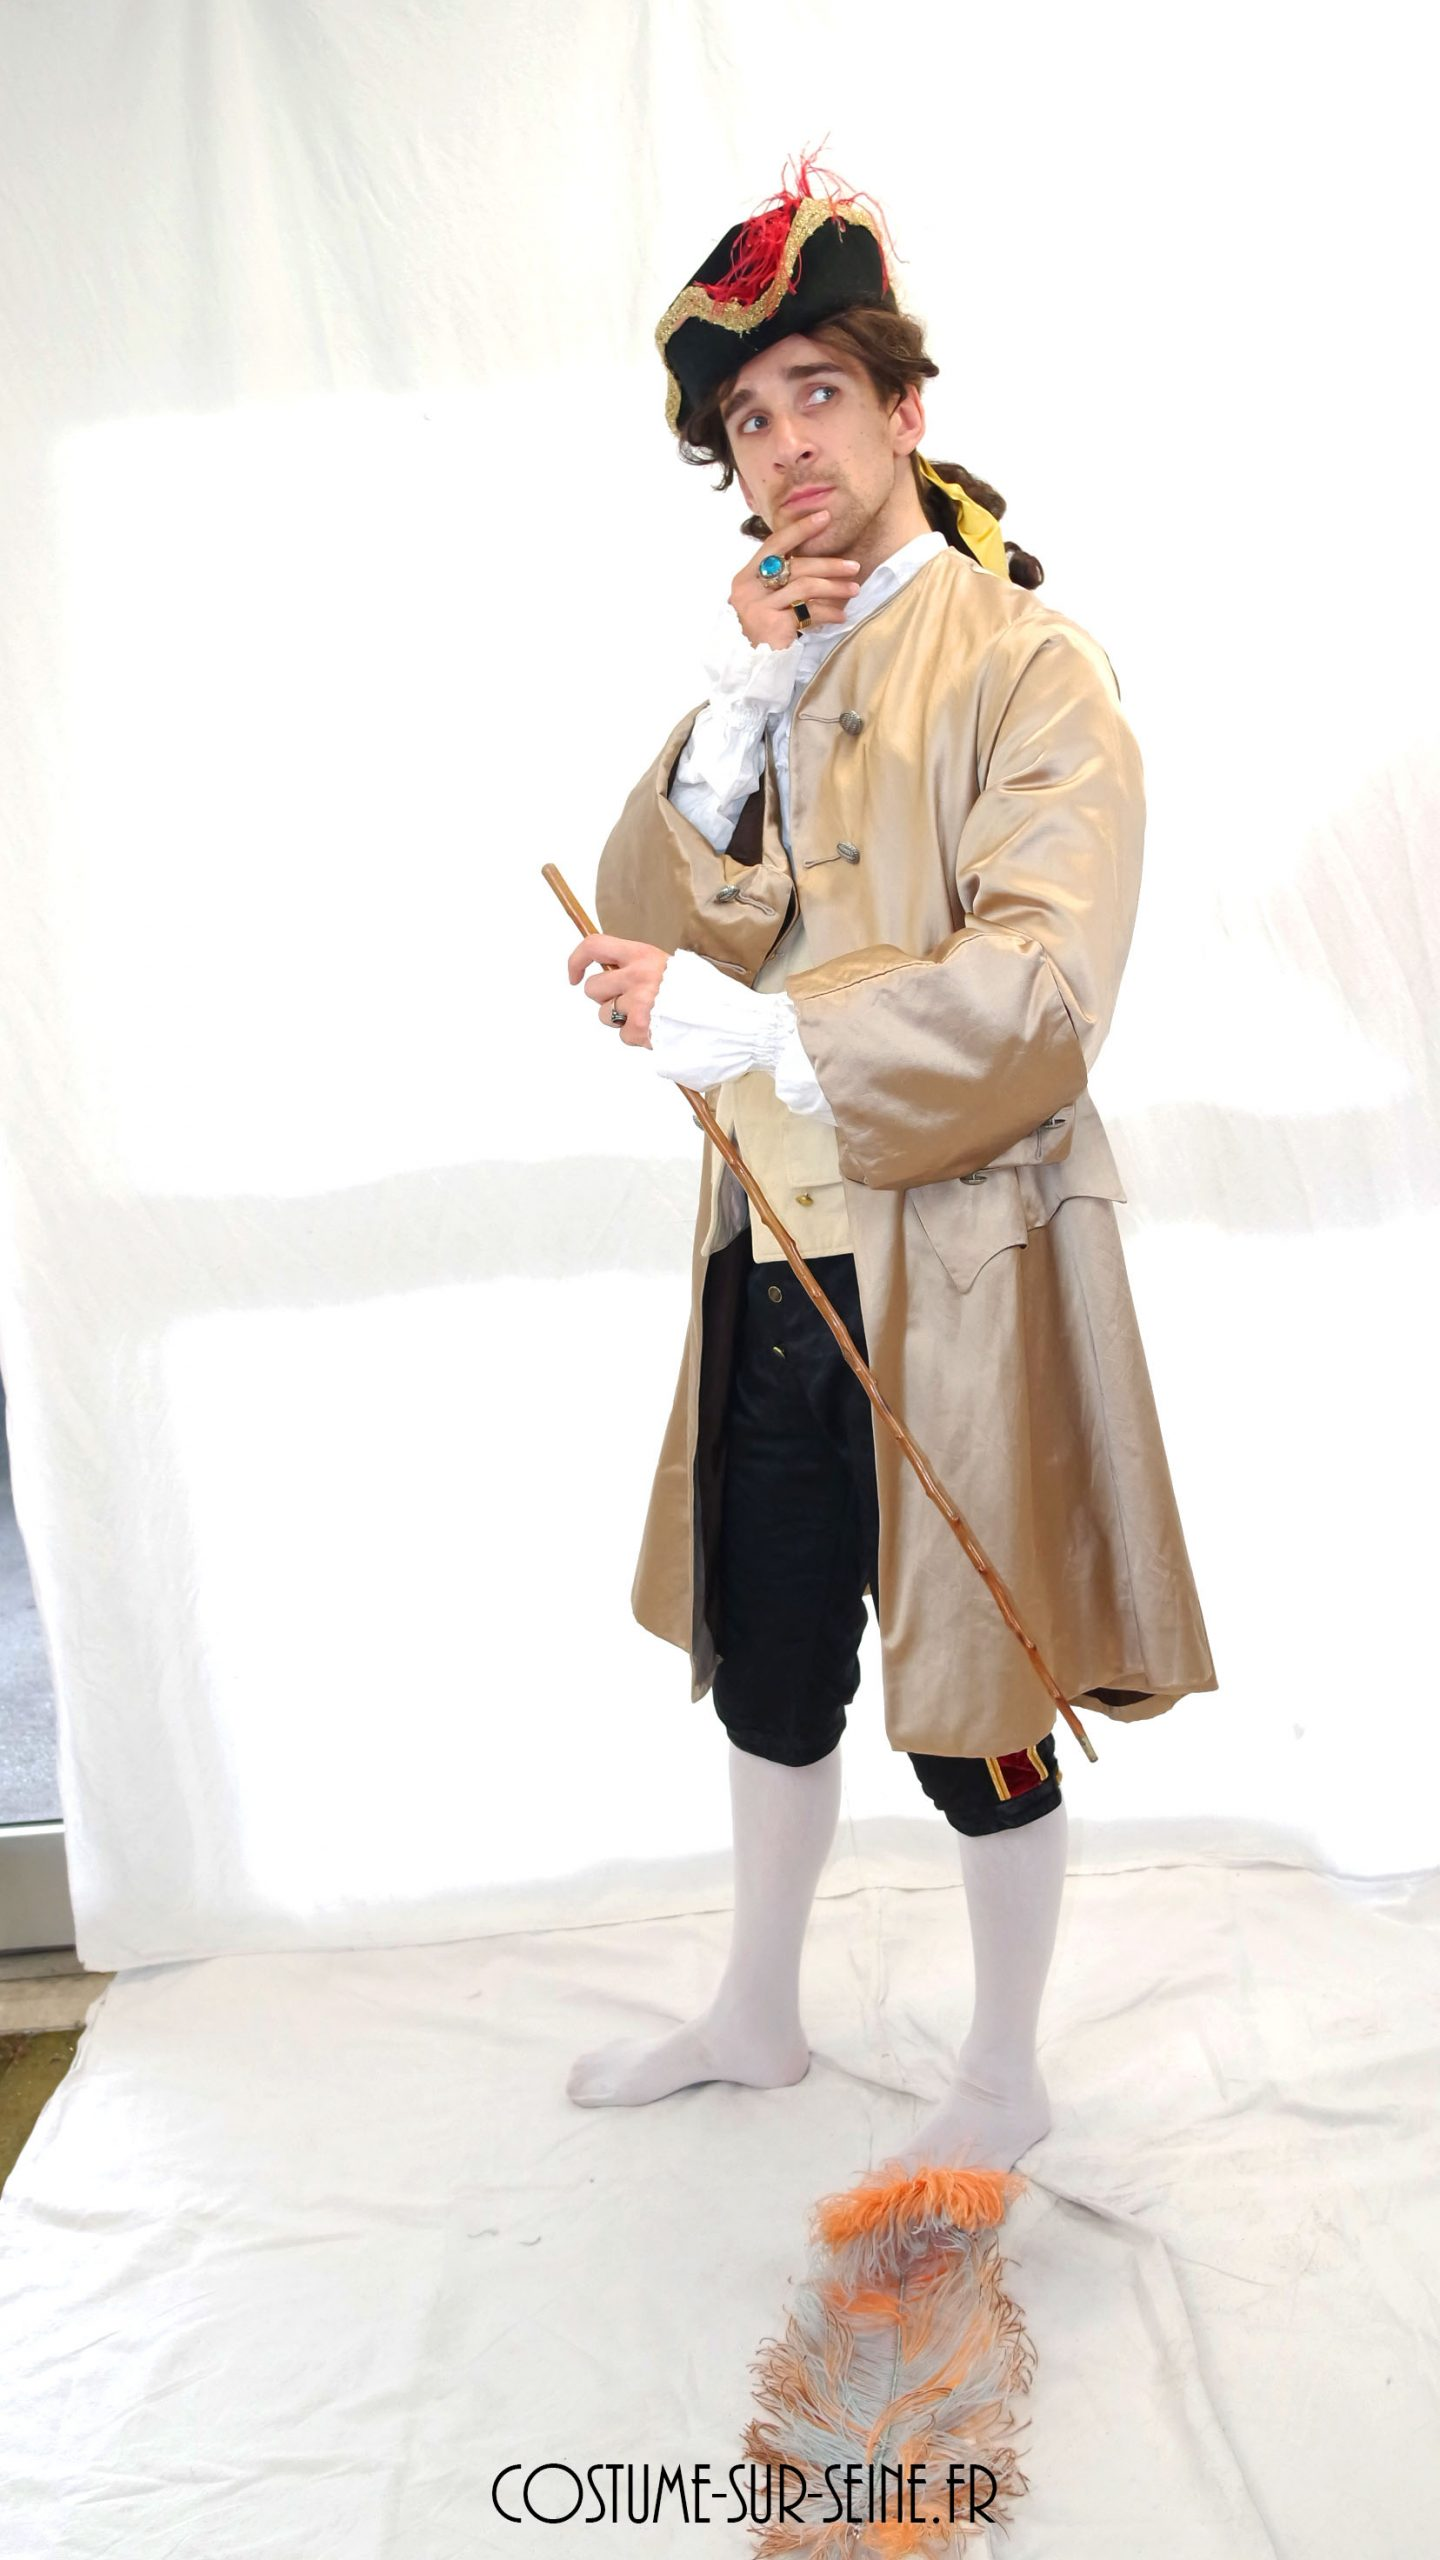 Baron costume